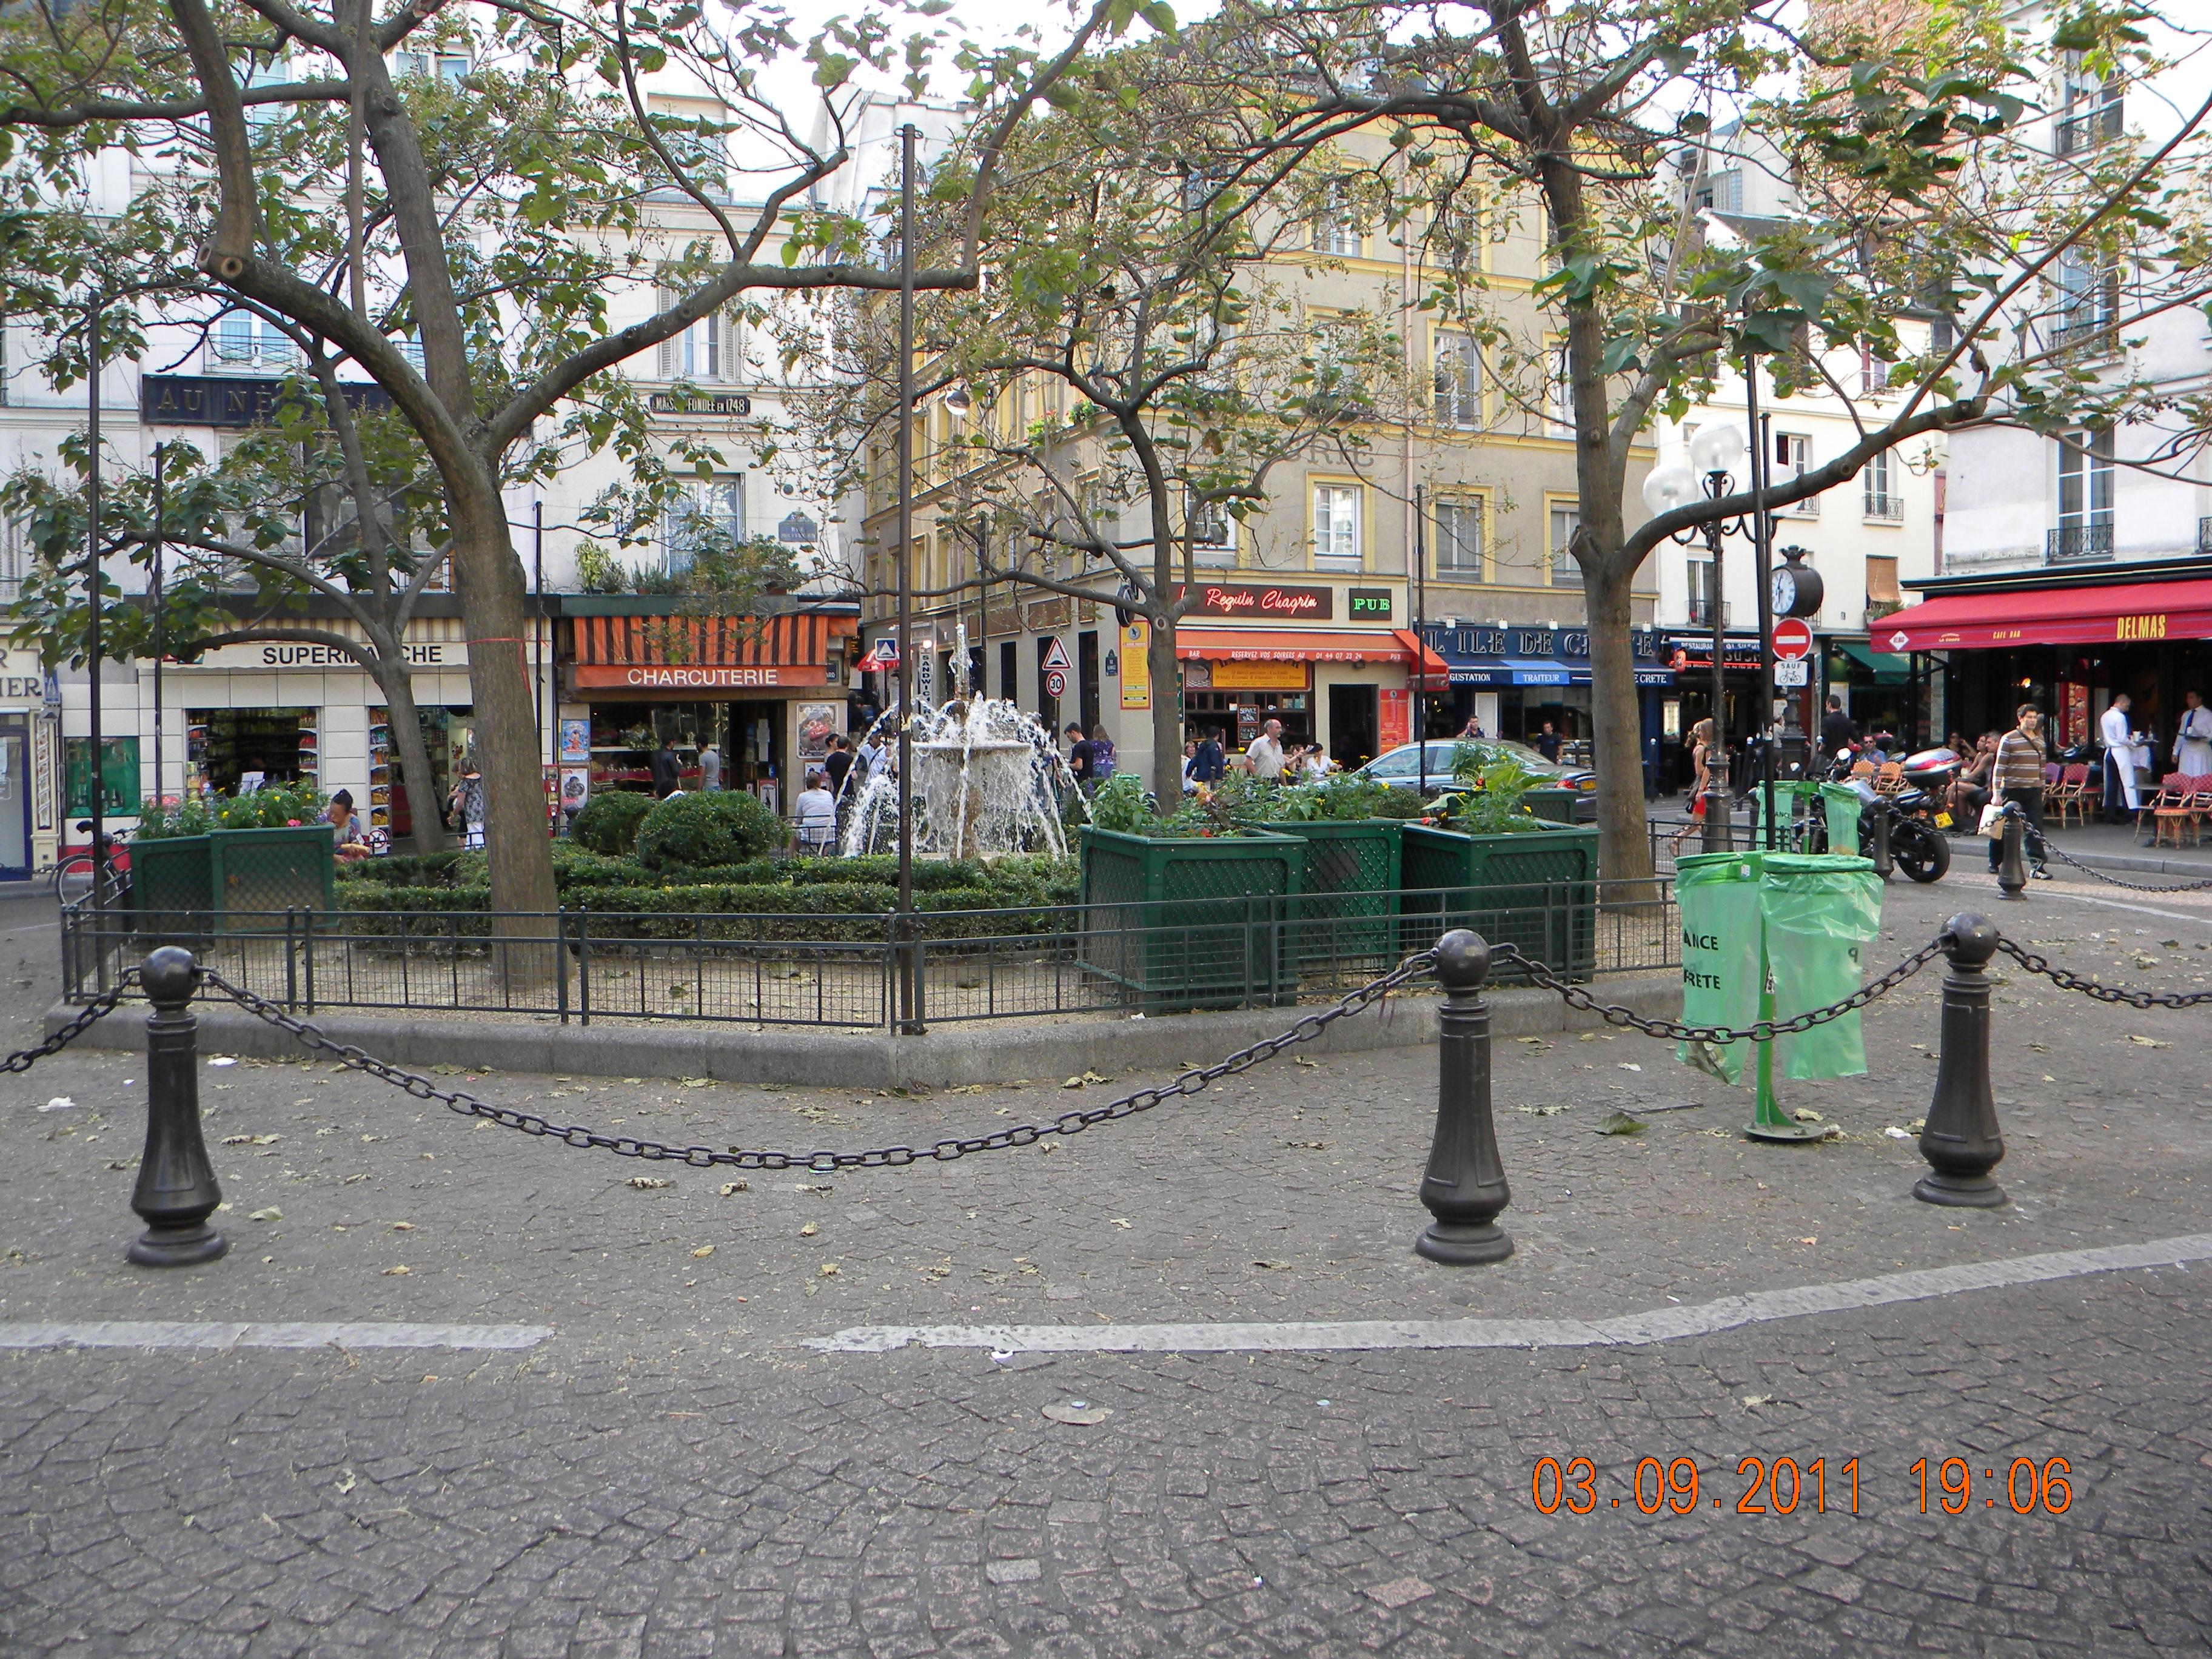 FilePlace de la Contrescarpe Parisjpg  Wikimedia Commons